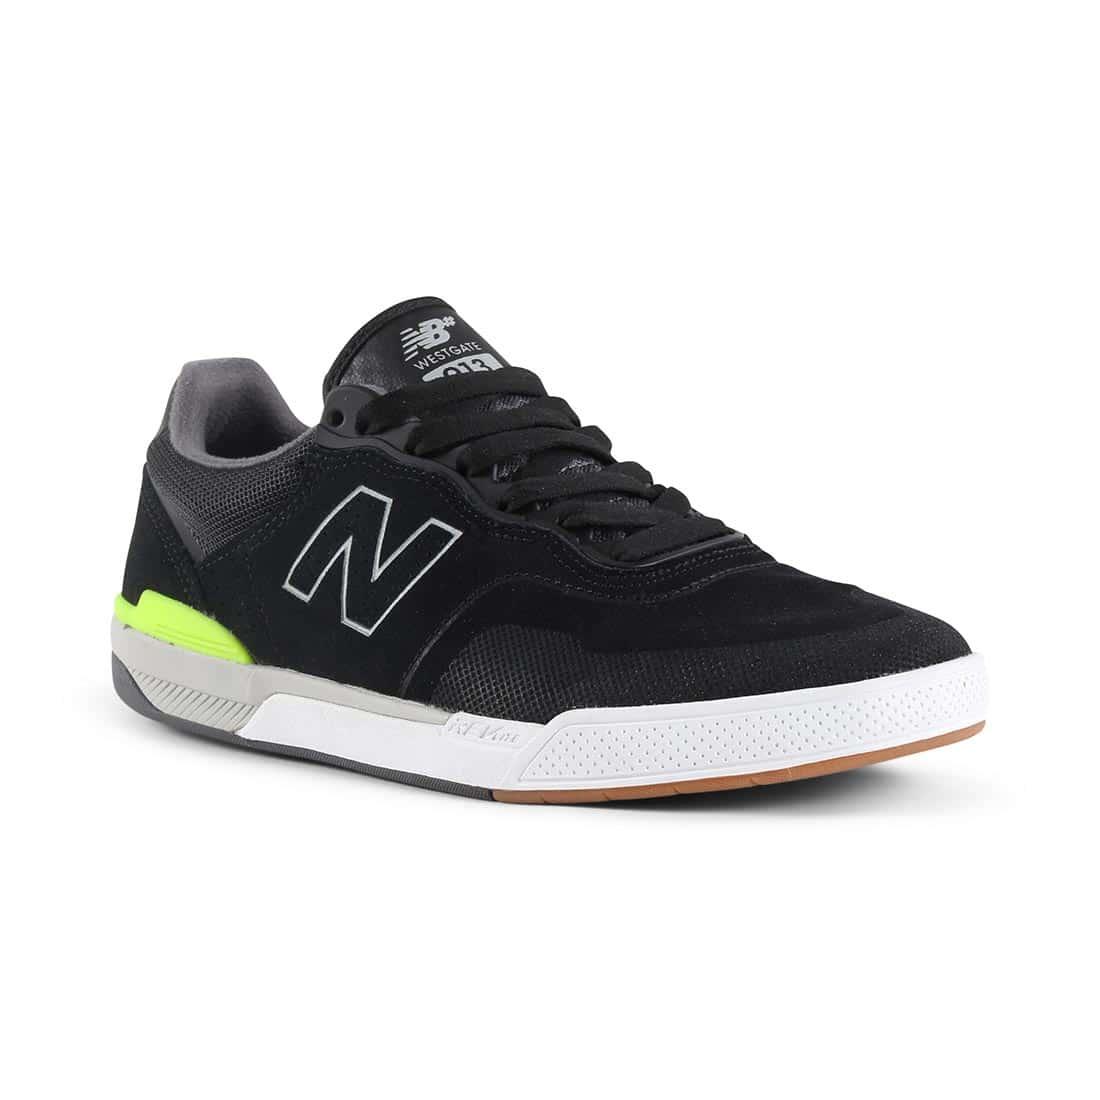 New Balance Numeric 913 Brandon